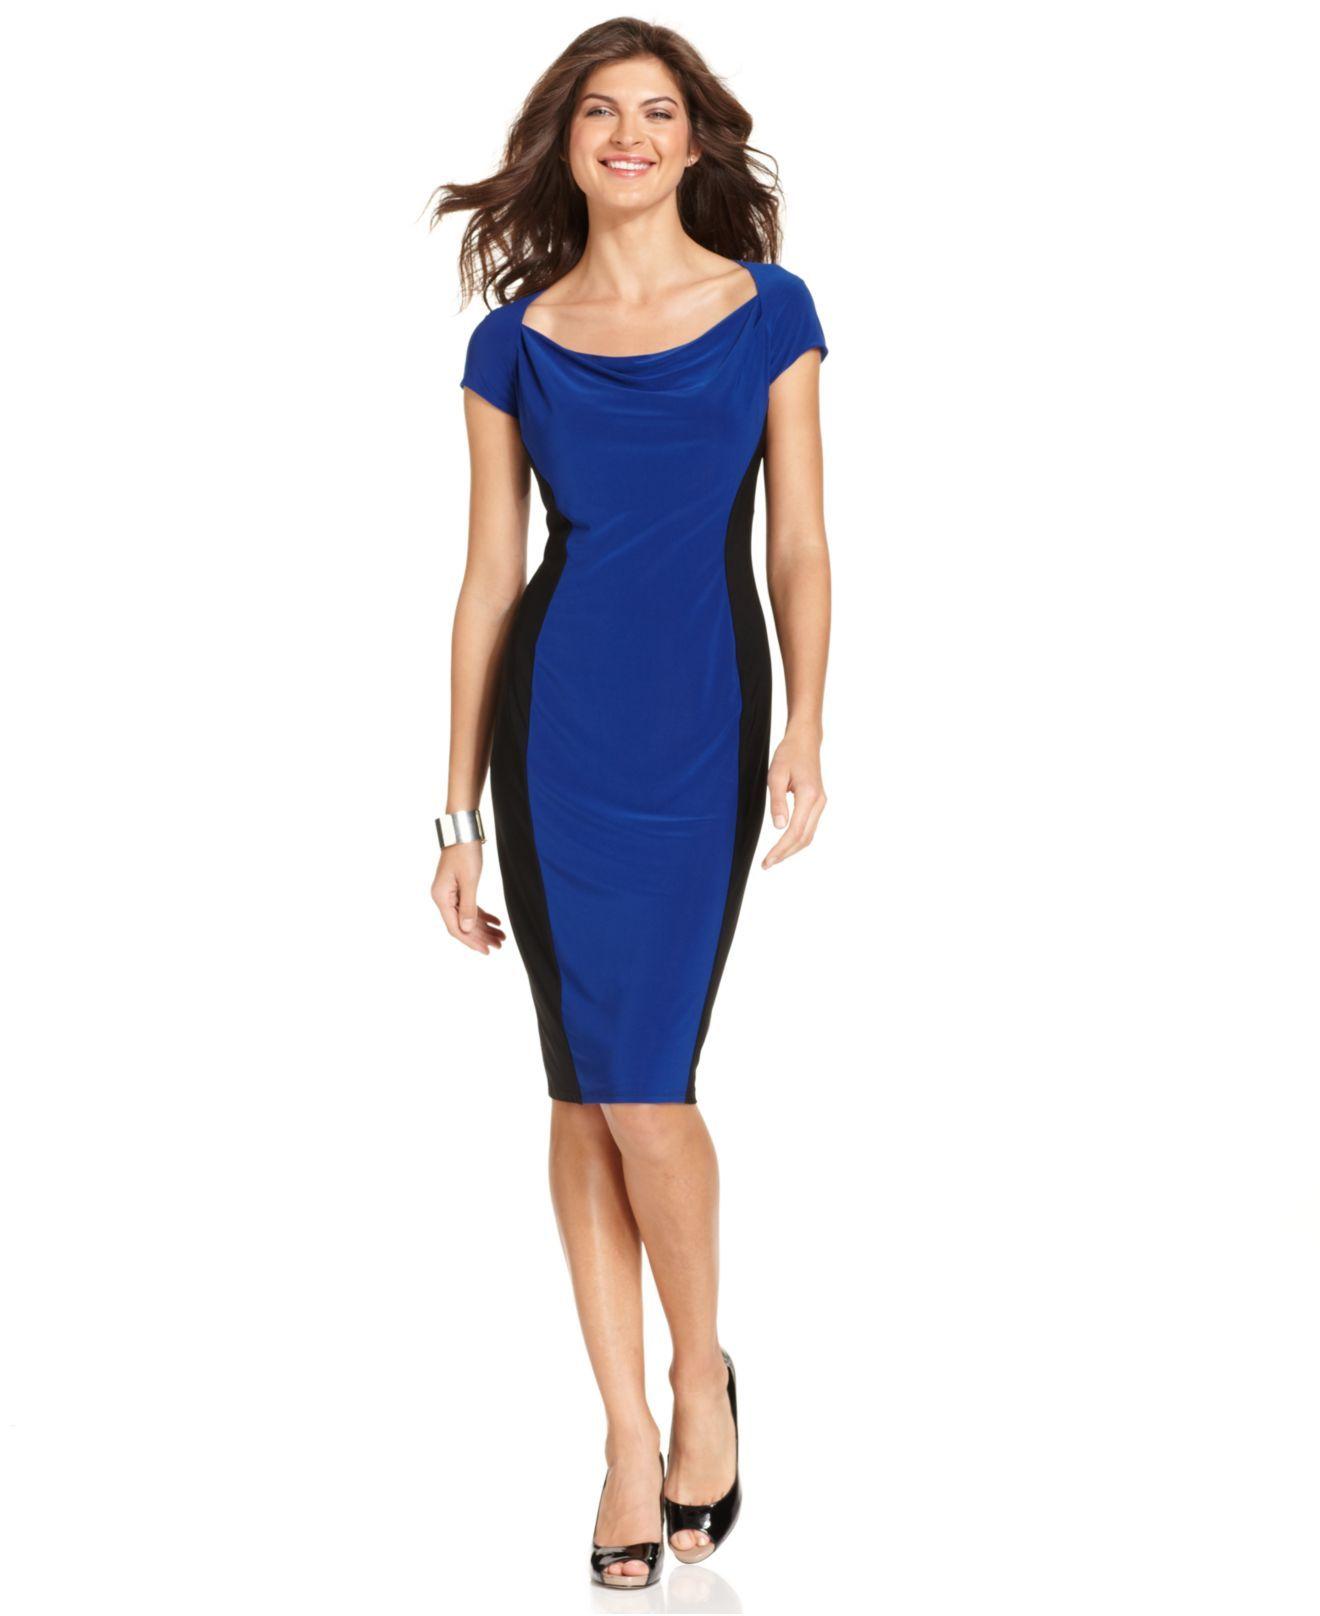 Jones New York Dress CapSleeve Colorblocked Sheath Womens